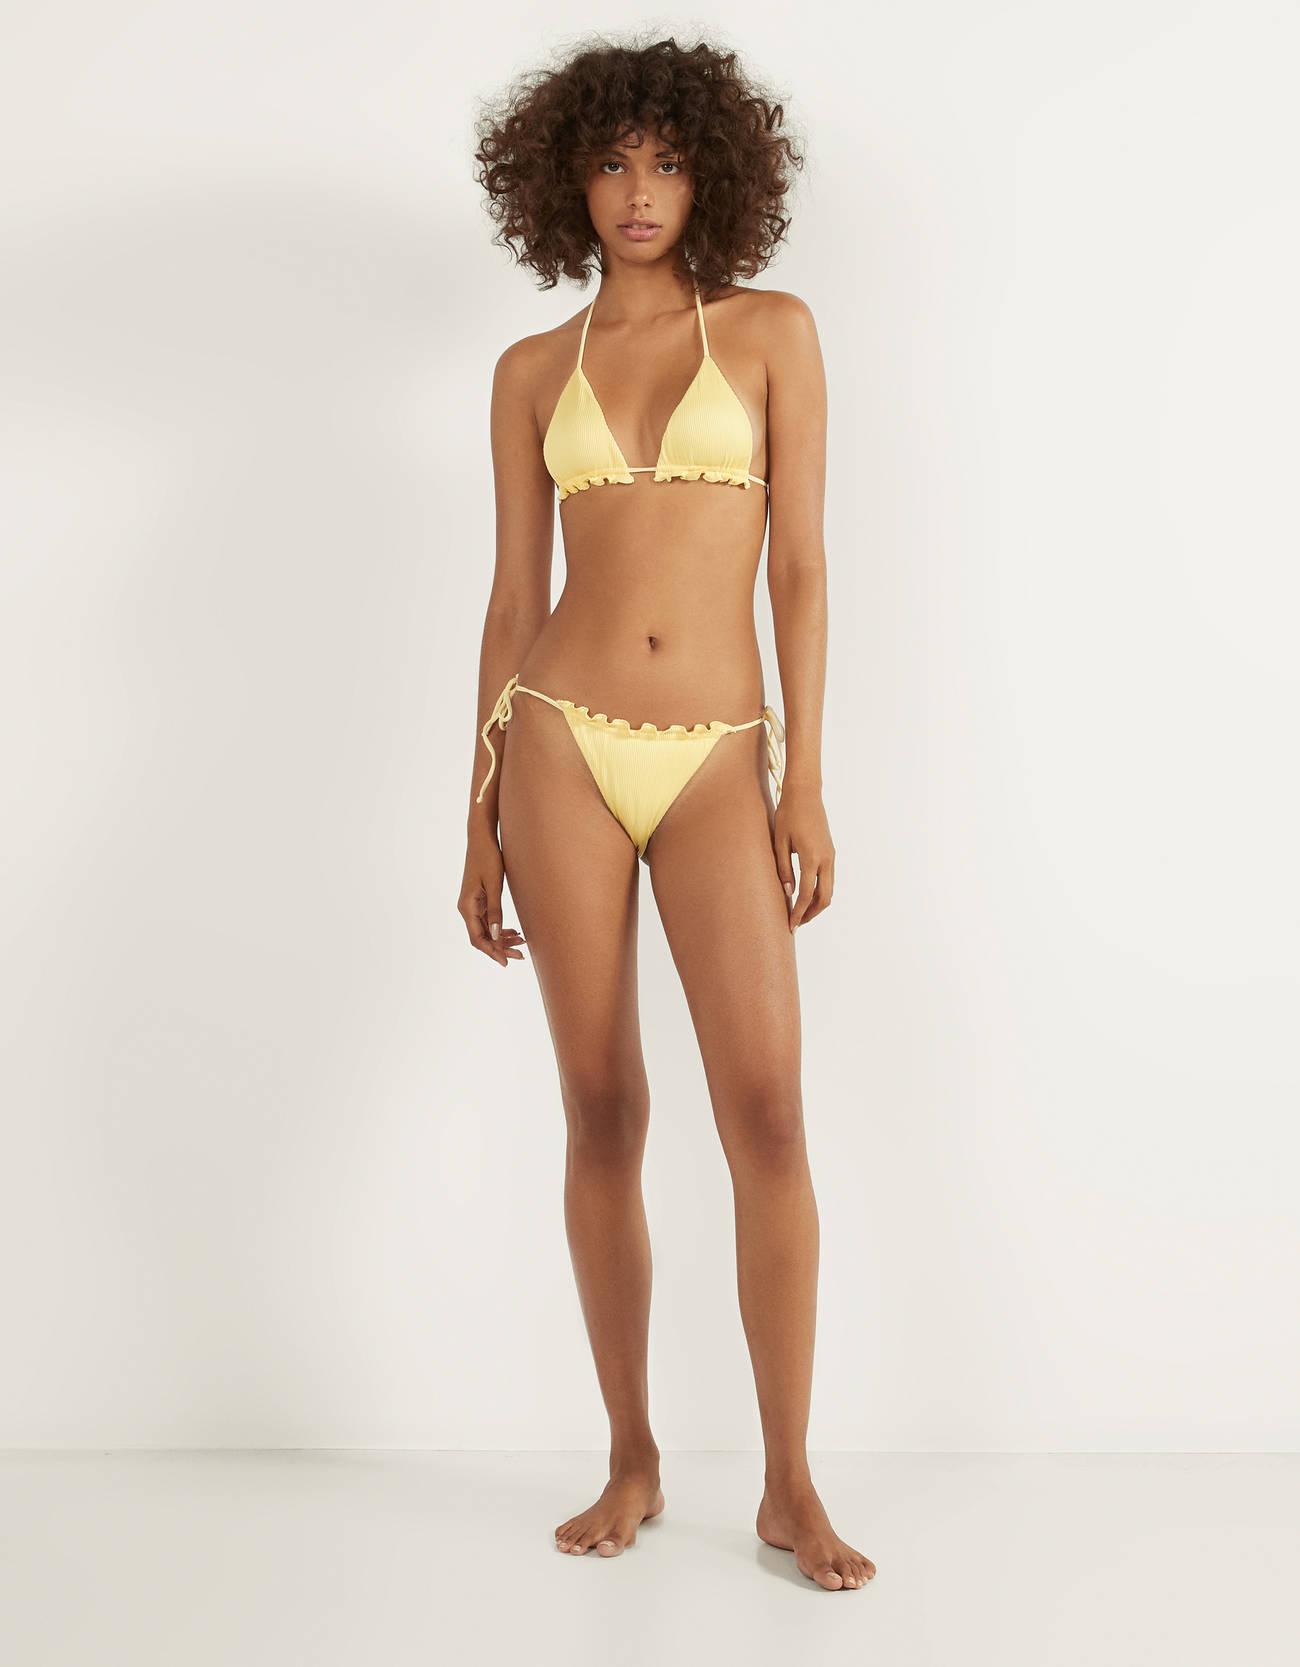 Pastel yellow textured bikini top